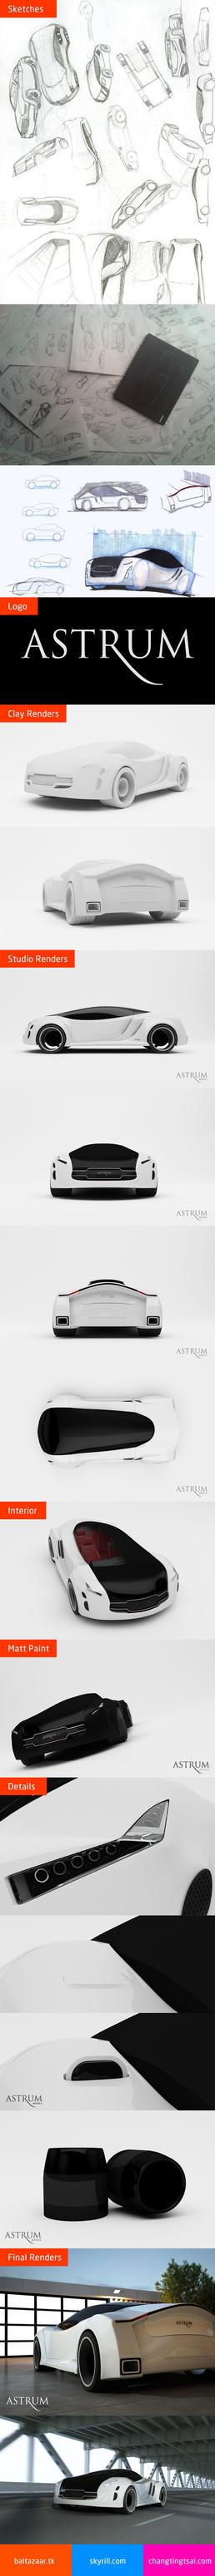 Astrum Meera 2011 by skyrill